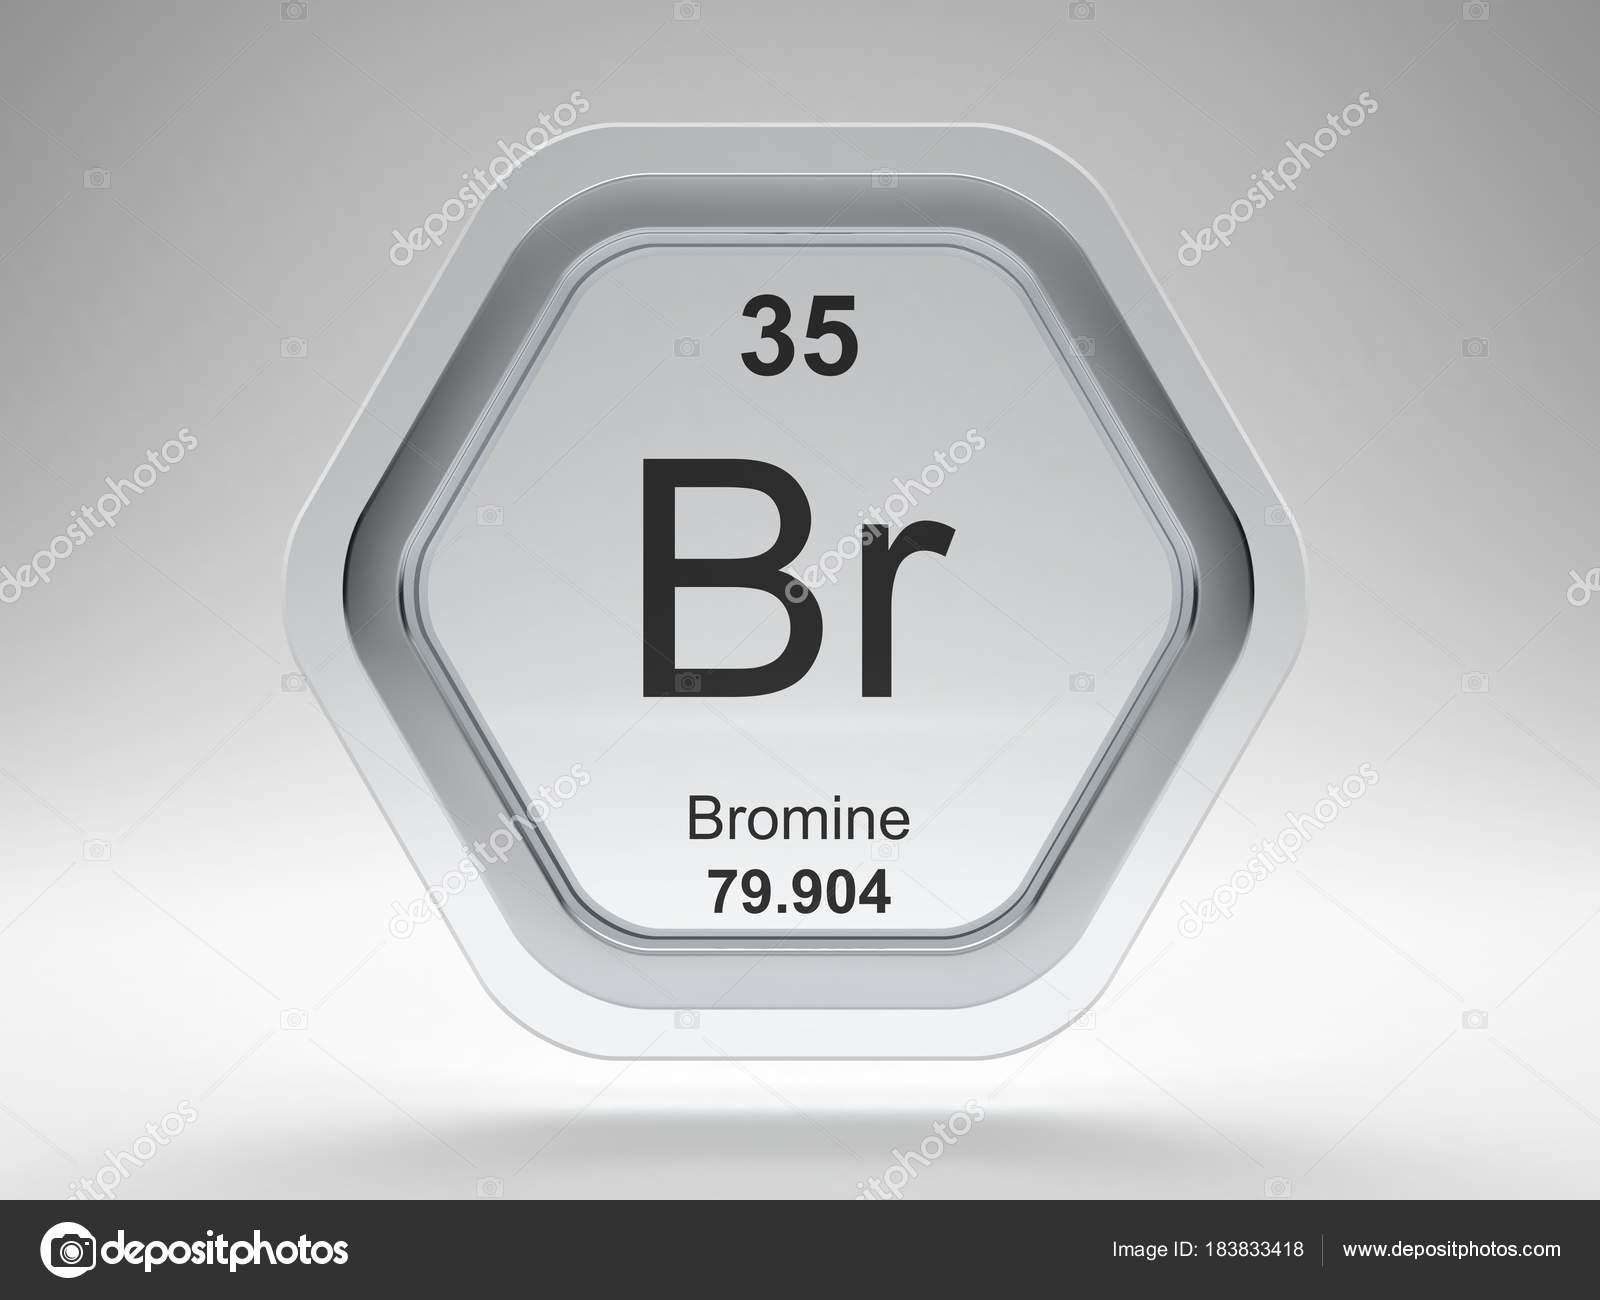 Bromine symbol periodic table modern glass steel icon stock bromine symbol periodic table modern glass steel icon stock photo biocorpaavc